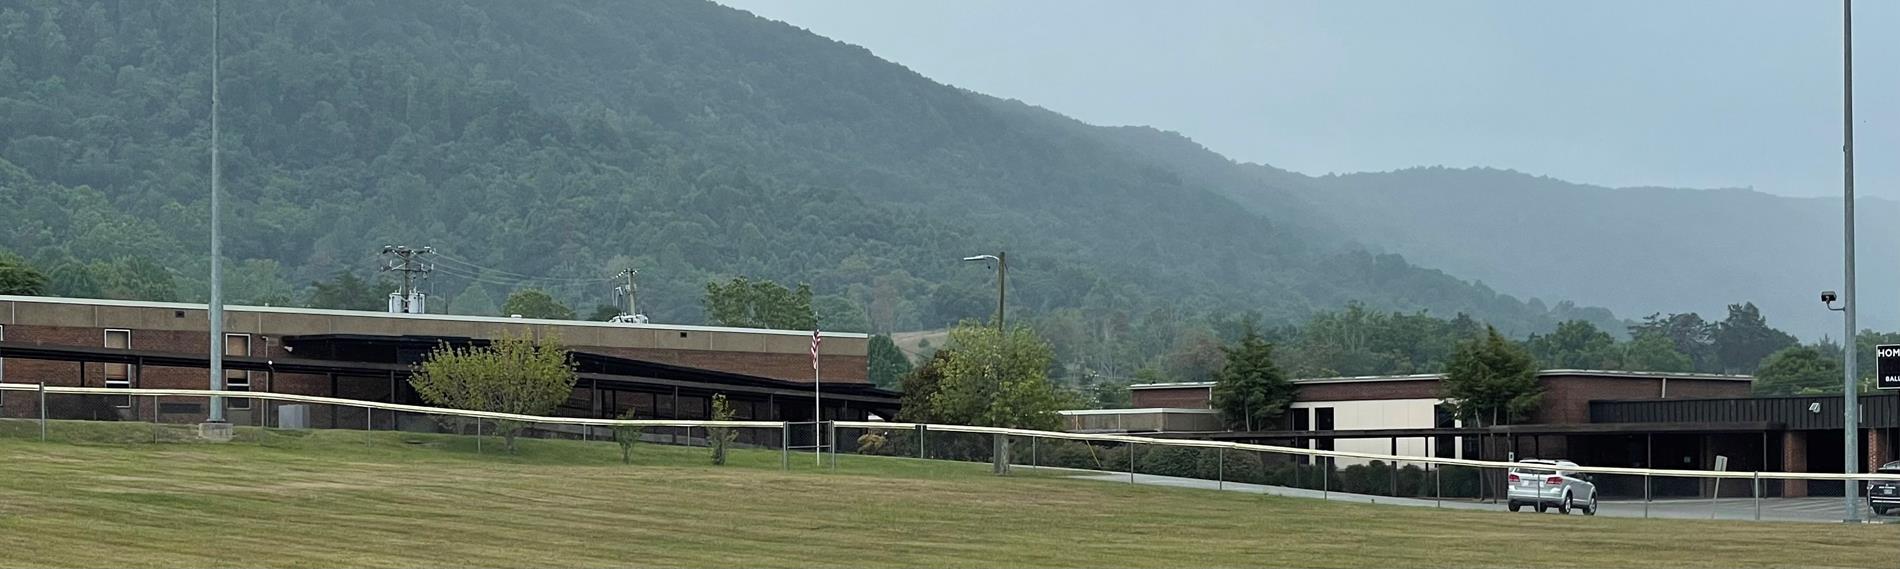 Washburn School